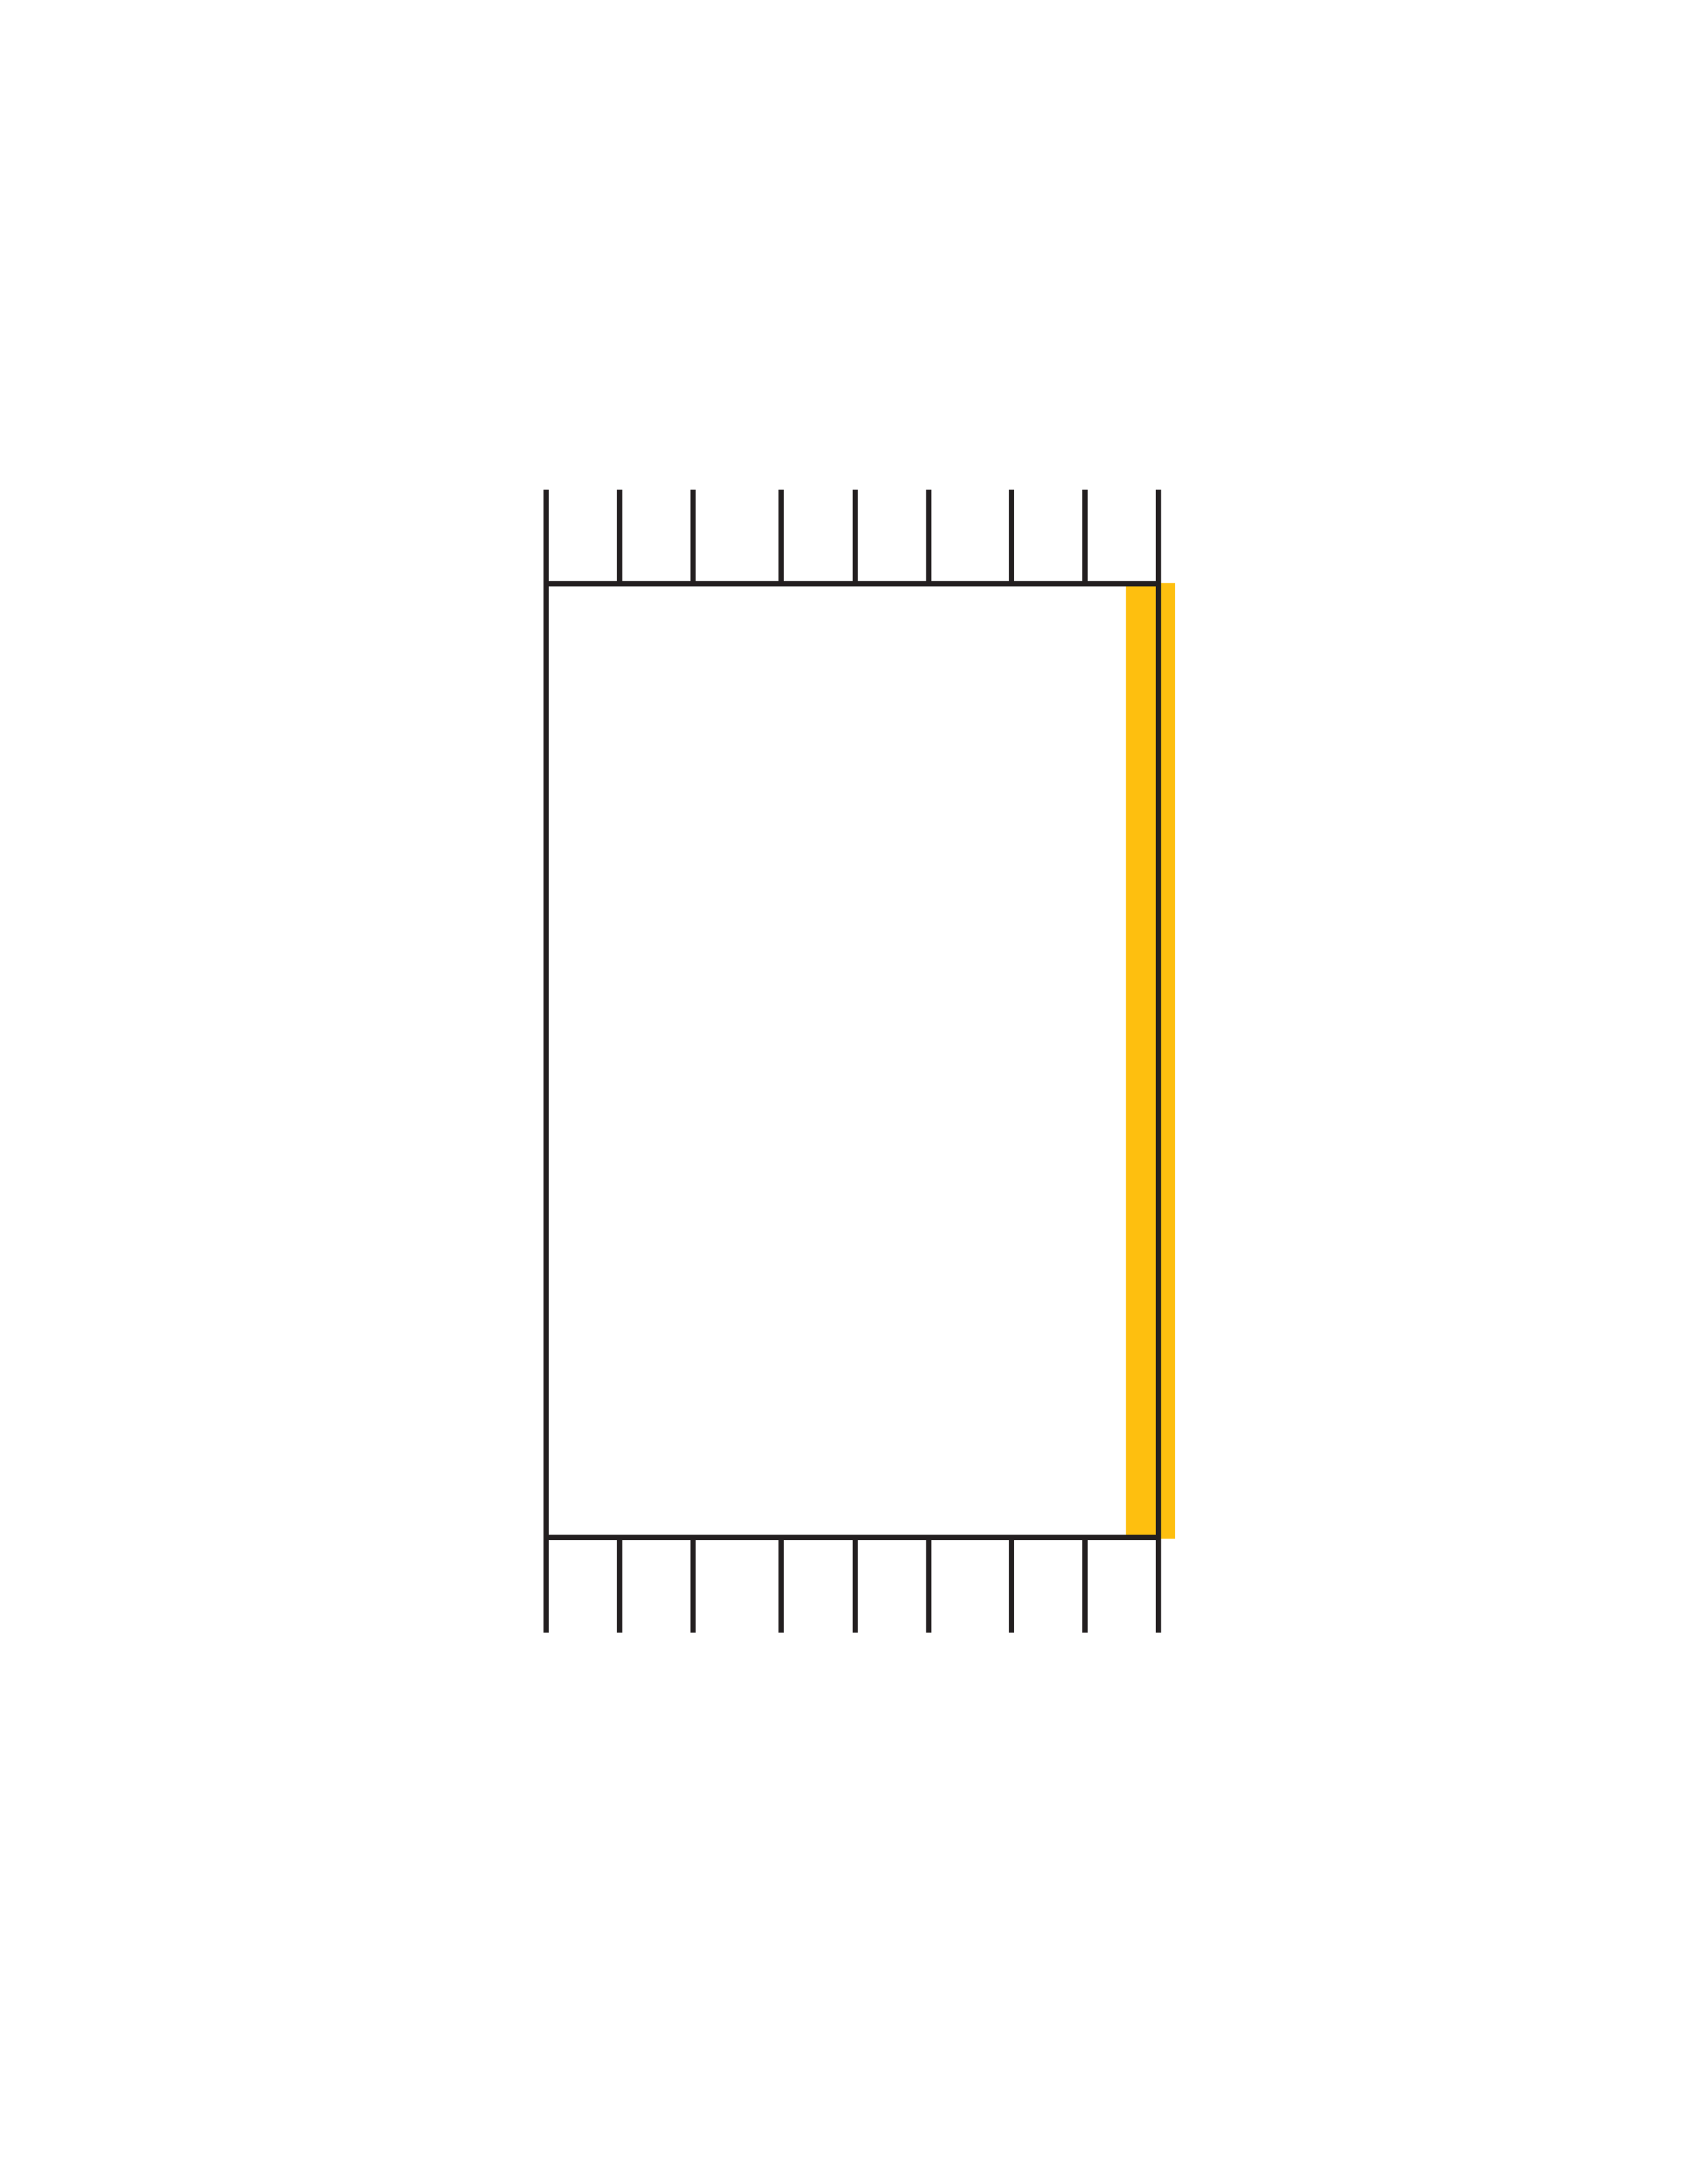 rug-01-01.png